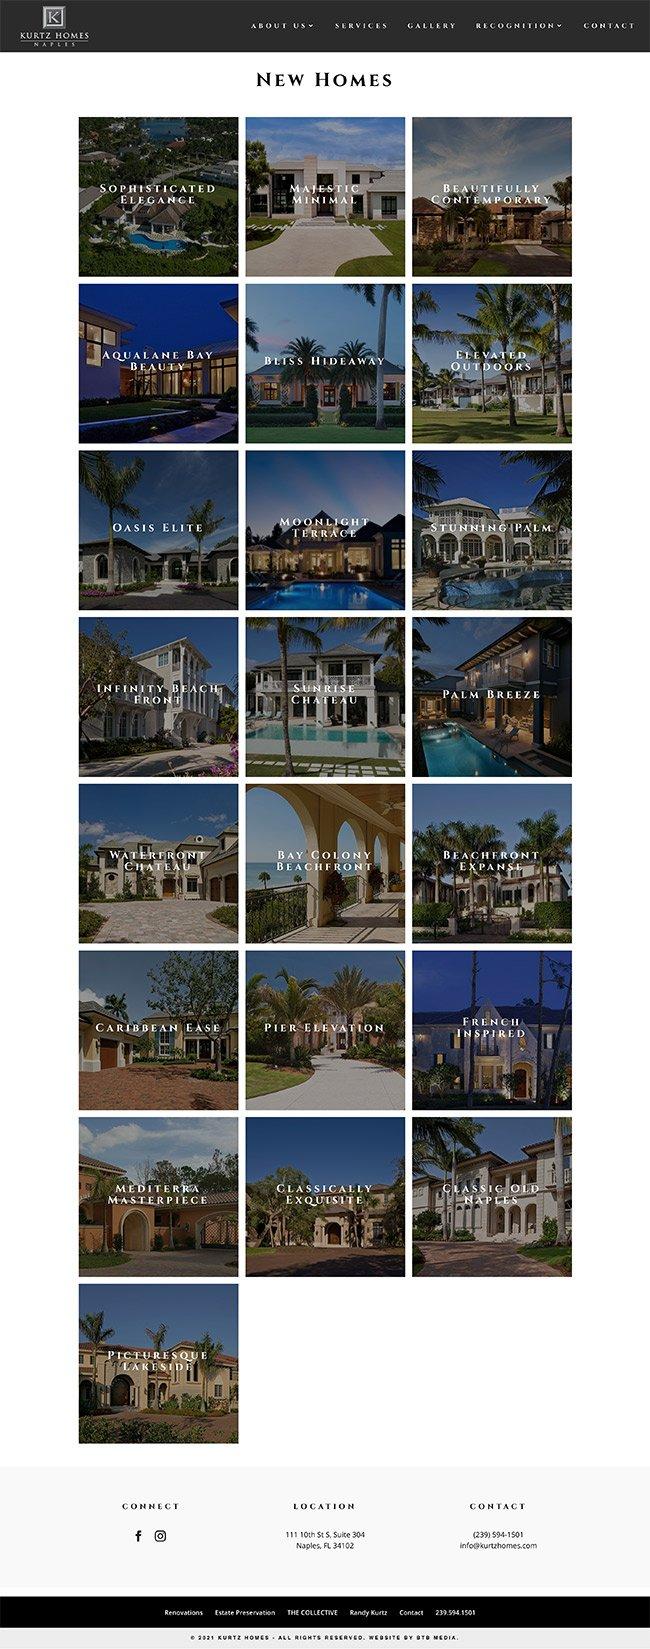 kurtz homes website design new homes